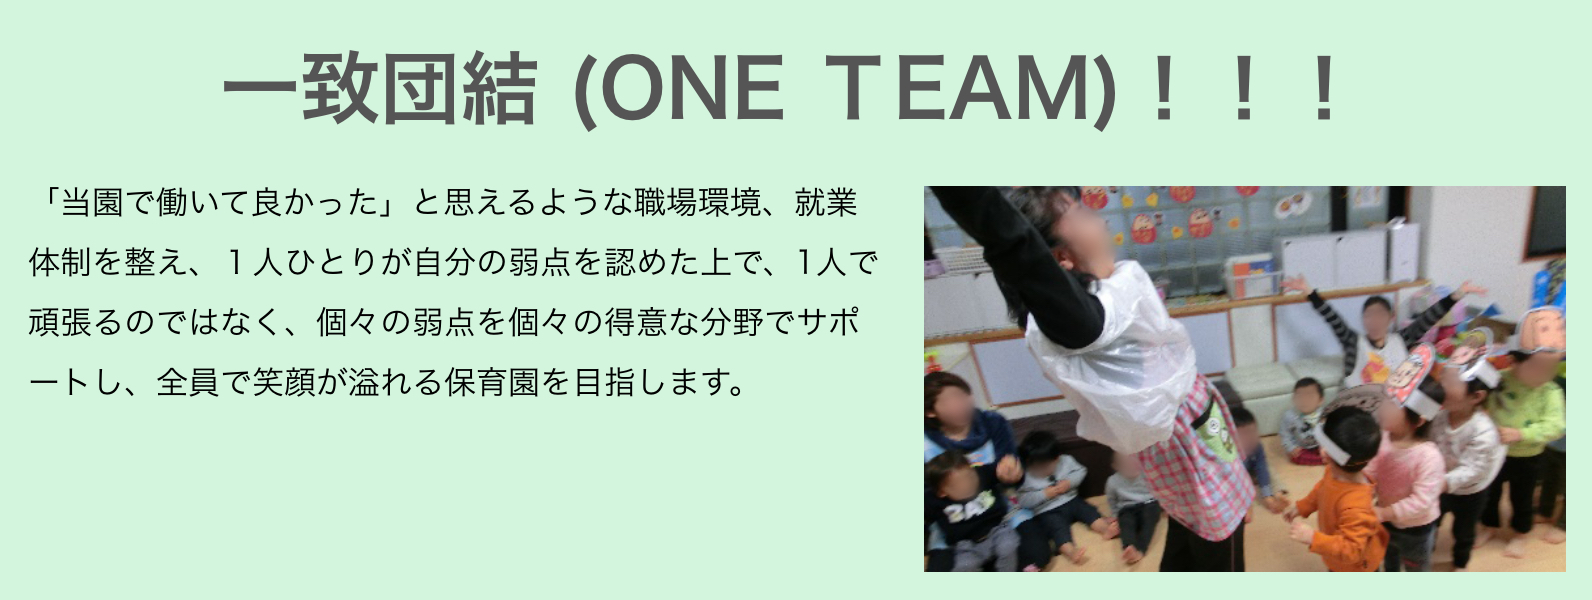 一致団結 (ONE TEAM)!!!